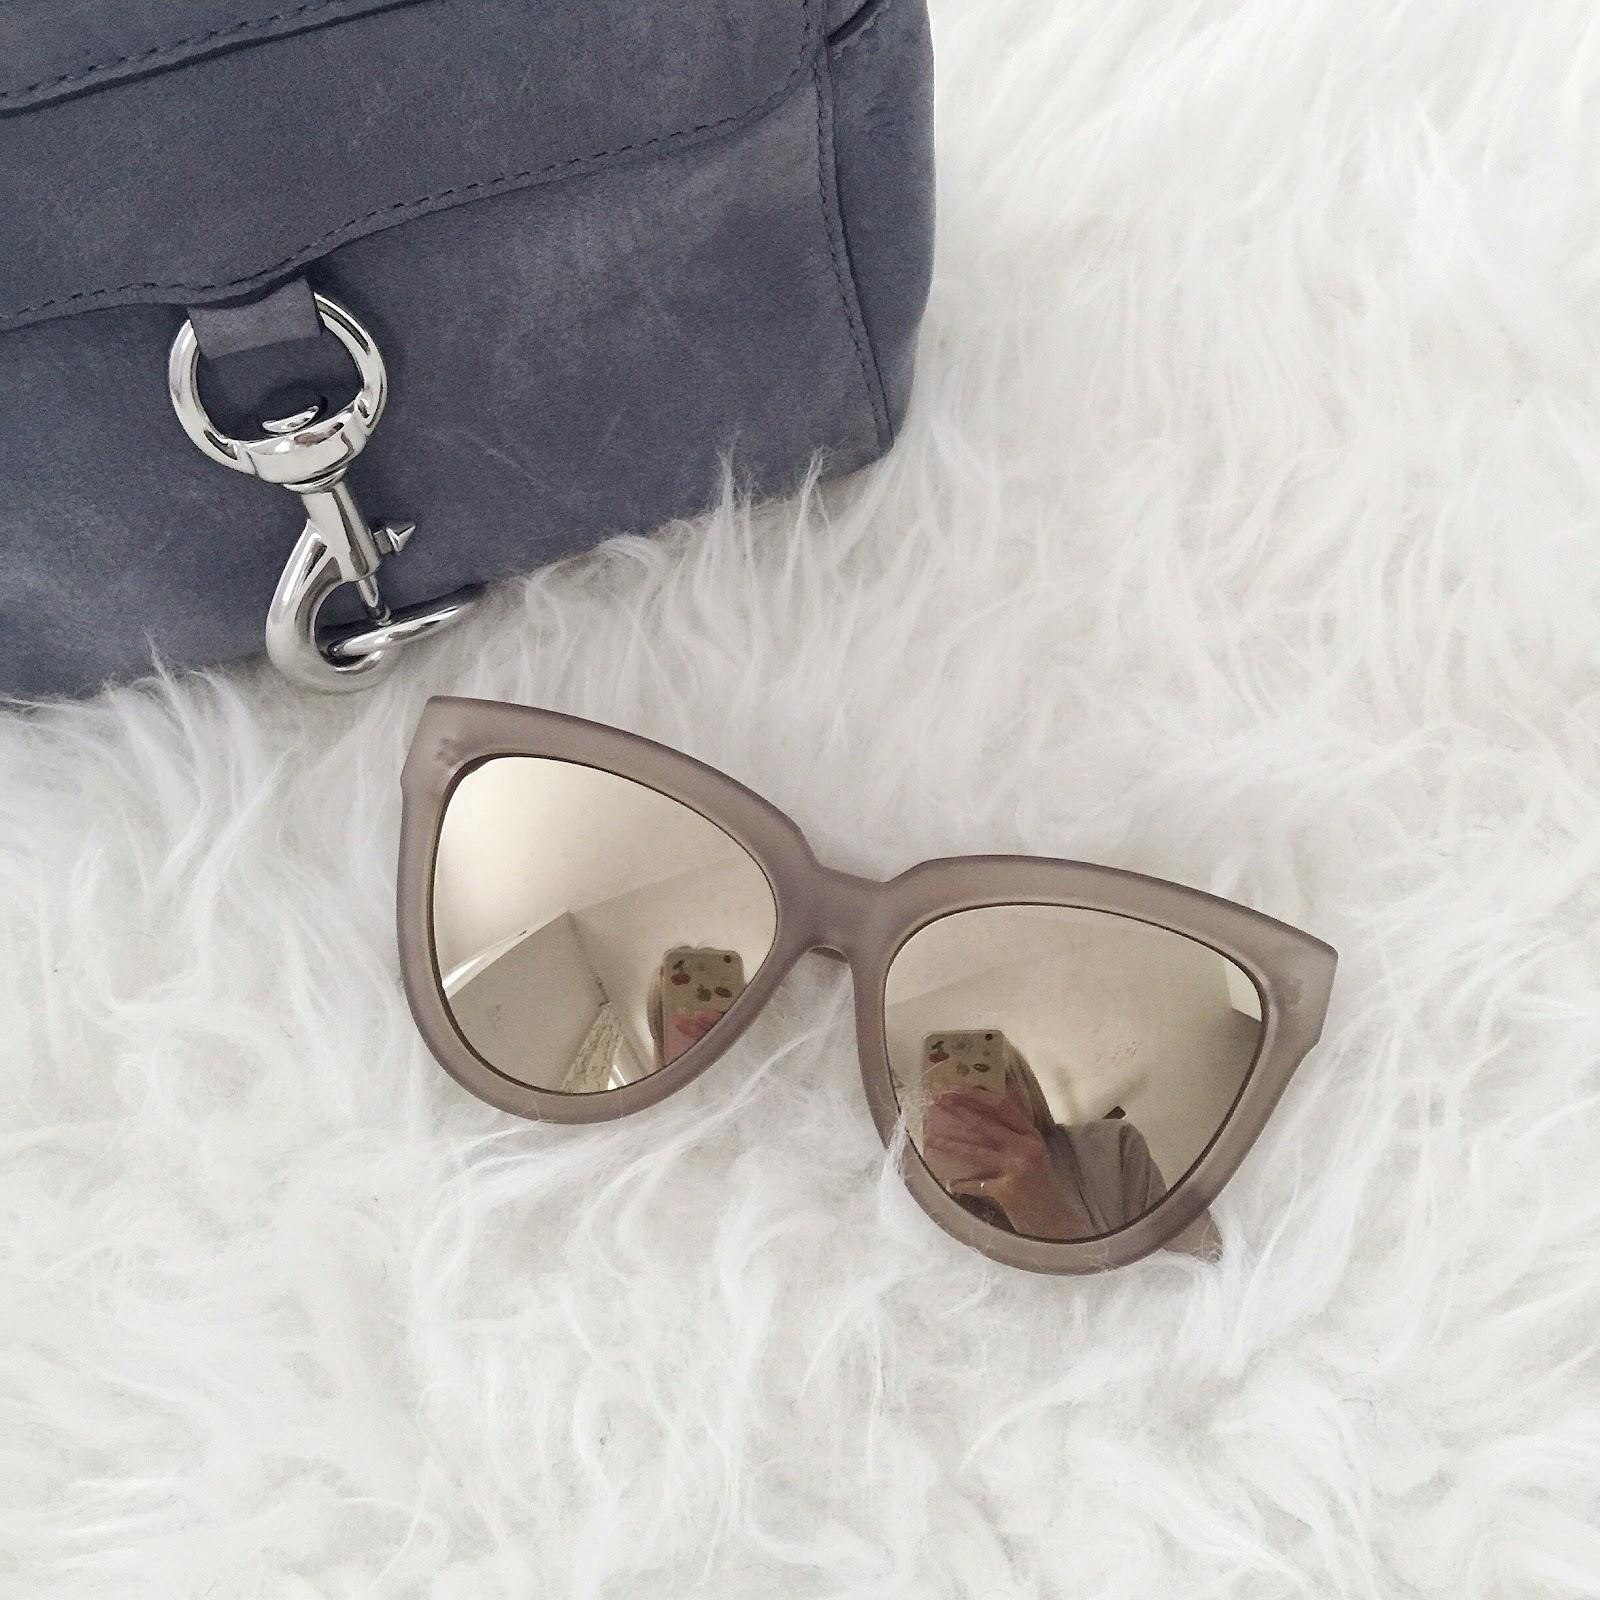 Le Specs 'liar liar' sunglasses